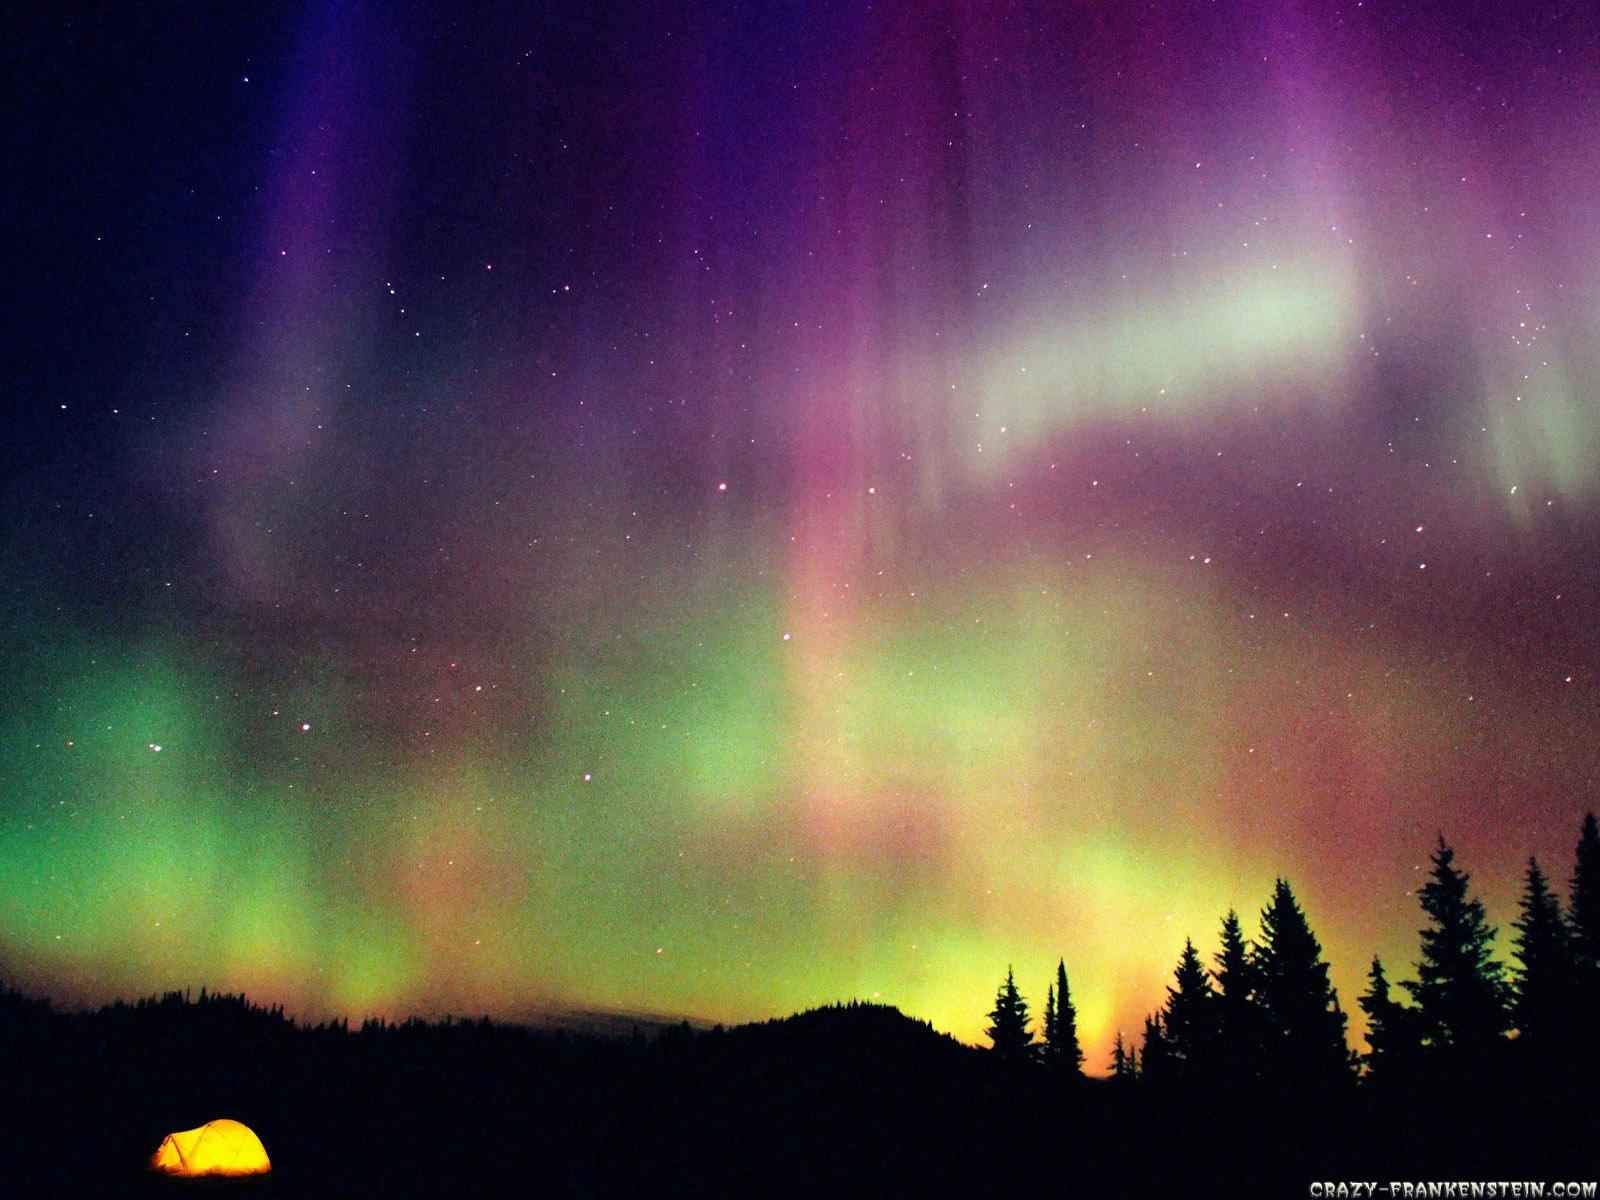 http://3.bp.blogspot.com/-F2i9kl5VLbQ/T94Bk8S1nUI/AAAAAAAAASQ/HTUVEp3fH7k/s1600/aurora+boreala+wallpaper+2.jpg